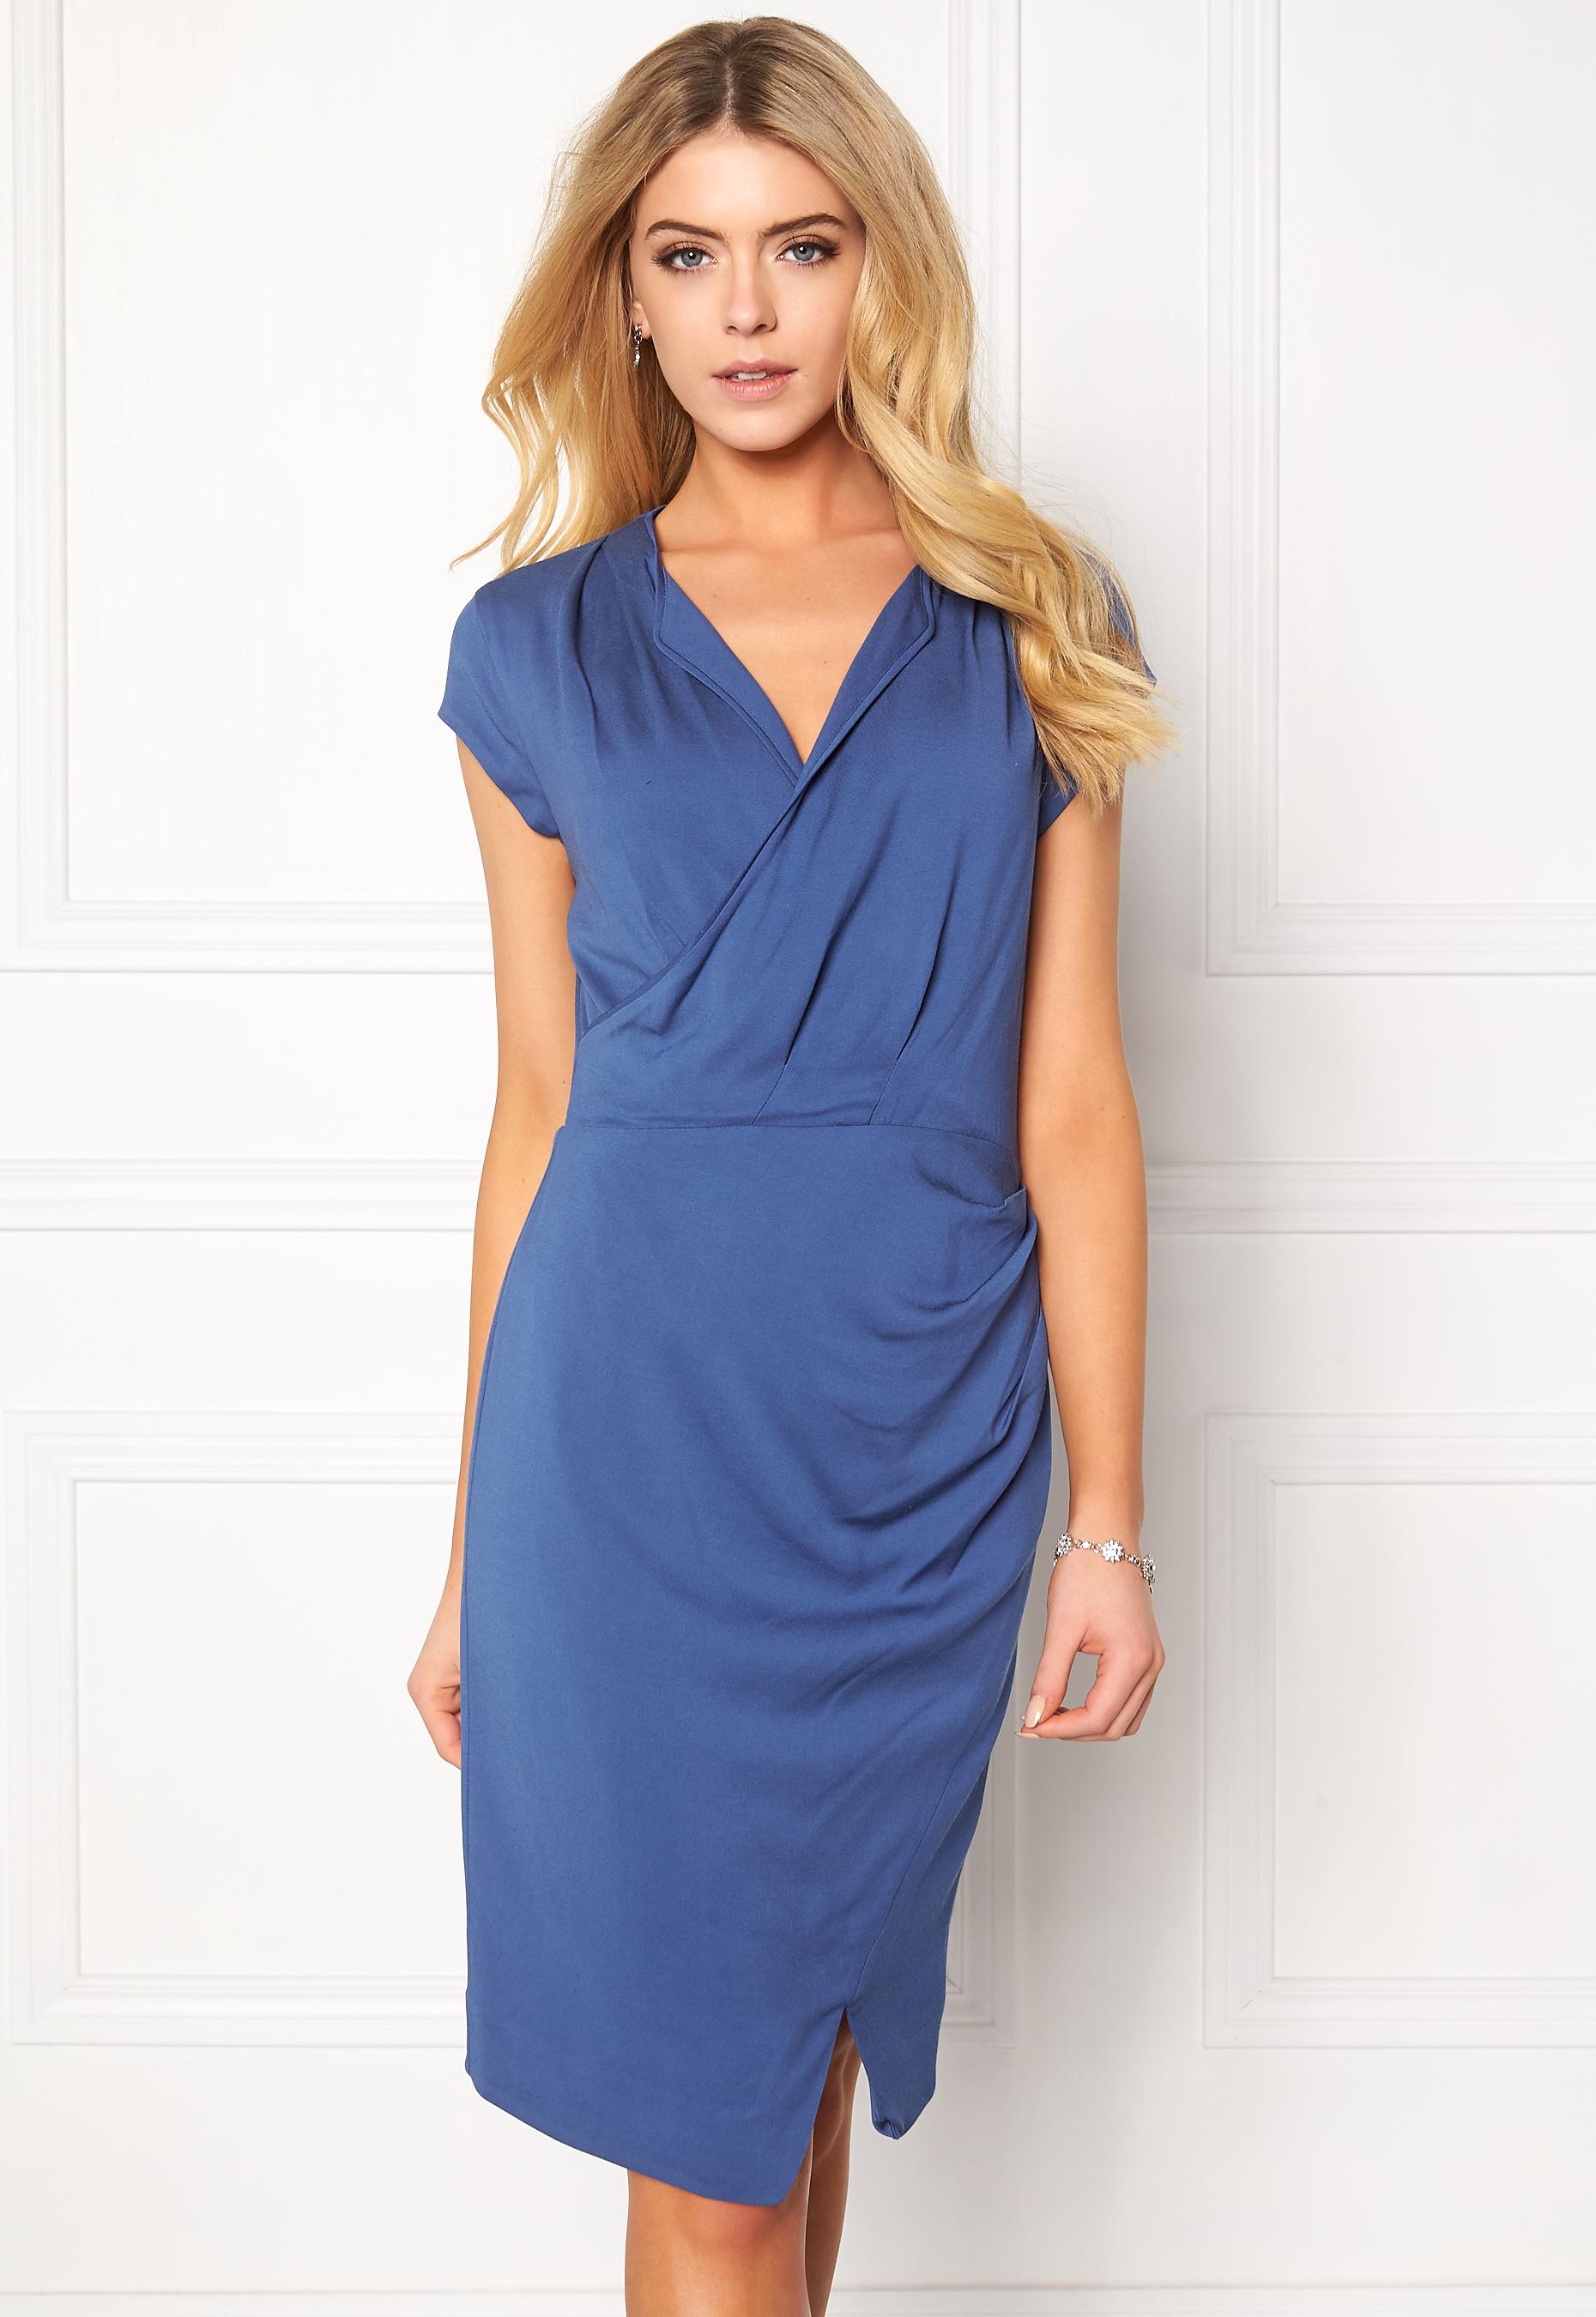 e6ec578c5a9 TIGER OF SWEDEN Karna 3 Dress 20Z Blue - Bubbleroom